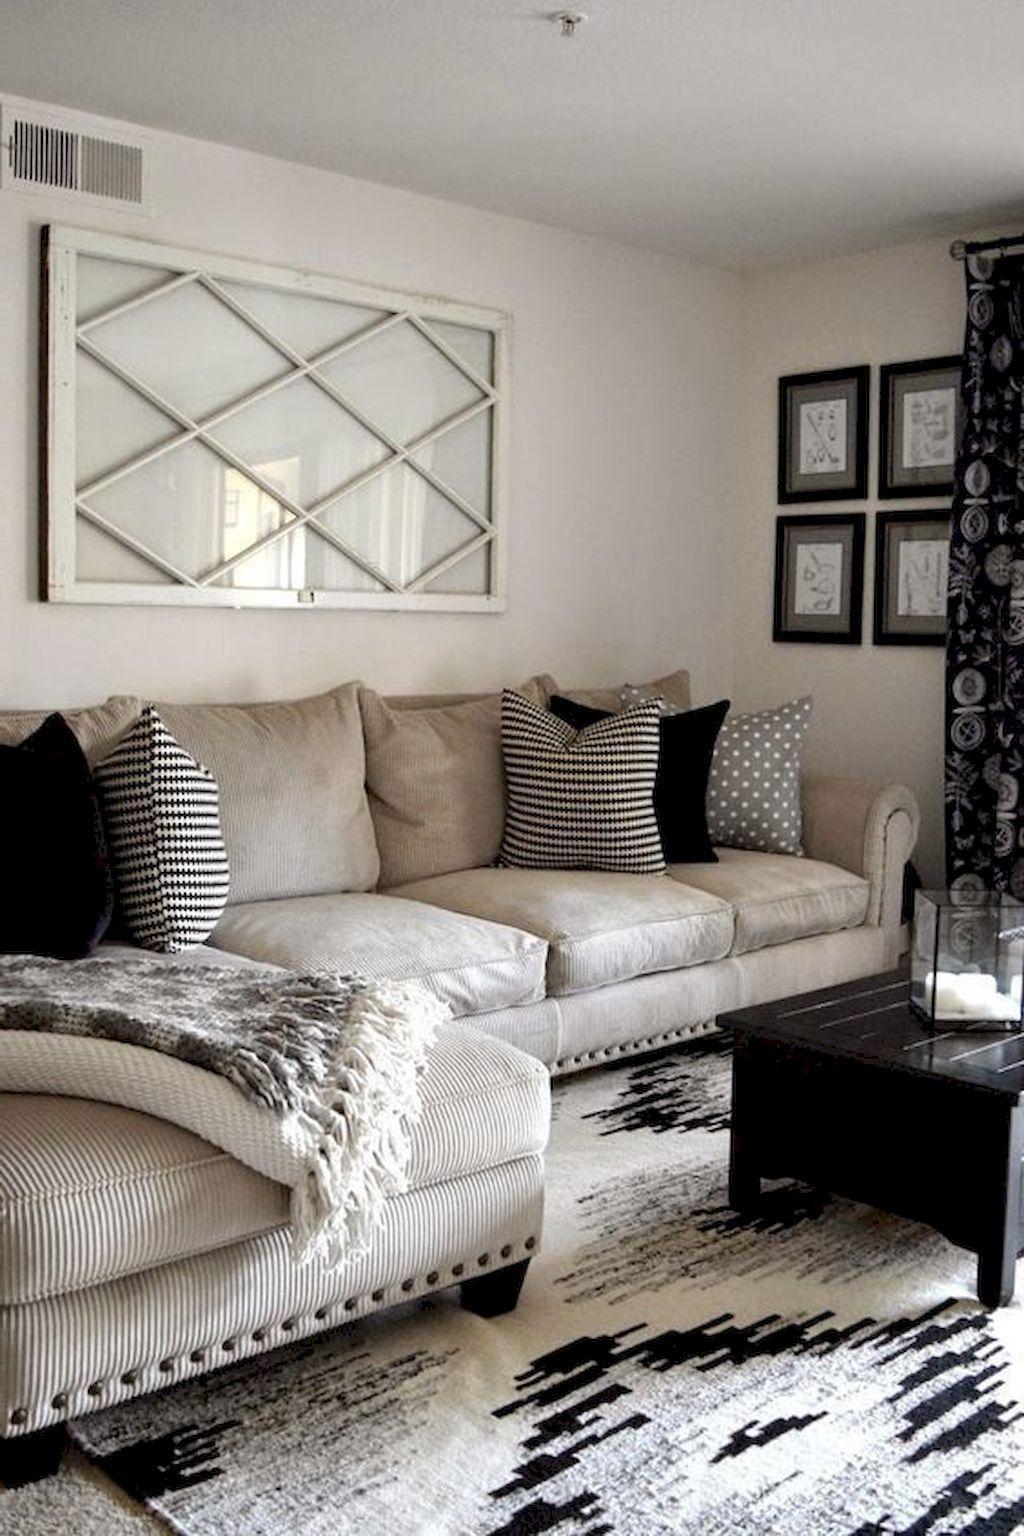 17 Trendiest Living Room Decorations Ideas Bedroom Ideas Pertaining To 10 Elegant Livin Living Room Decor Apartment Small Living Room Decor Small Living Rooms